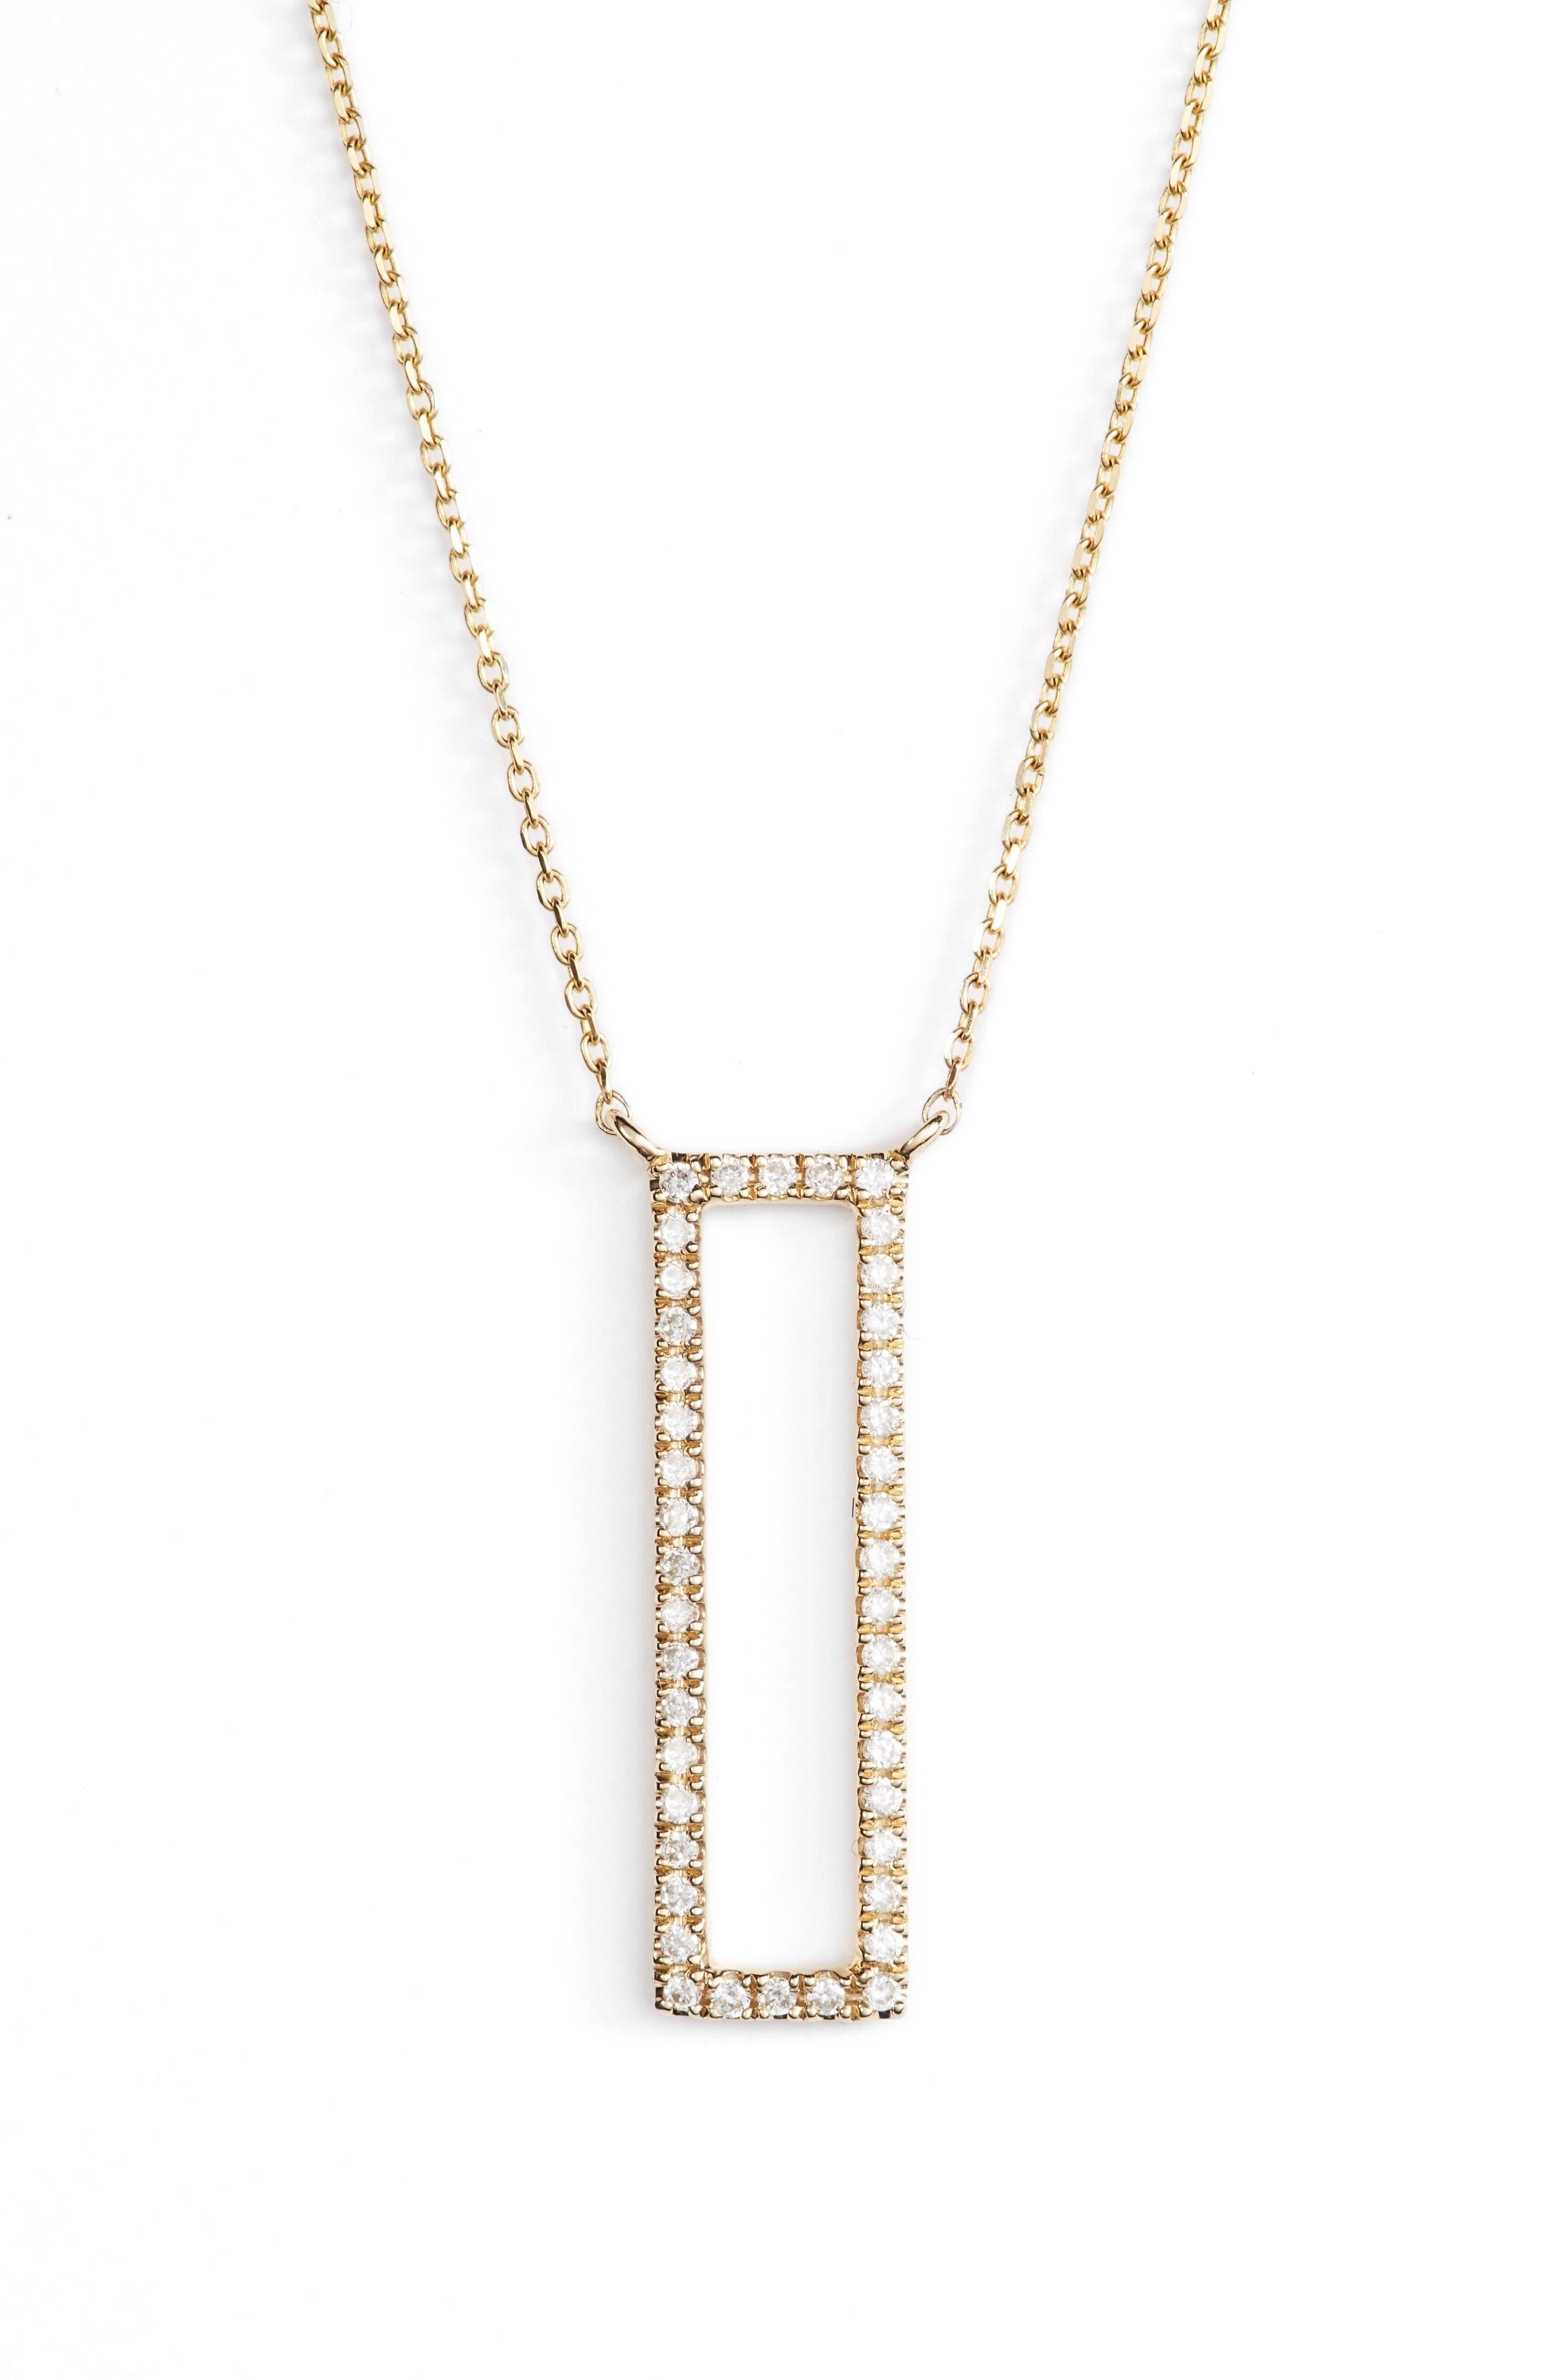 Alternate Image 1 Selected - Dana Rebecca Designs Diamond Pendant Necklace